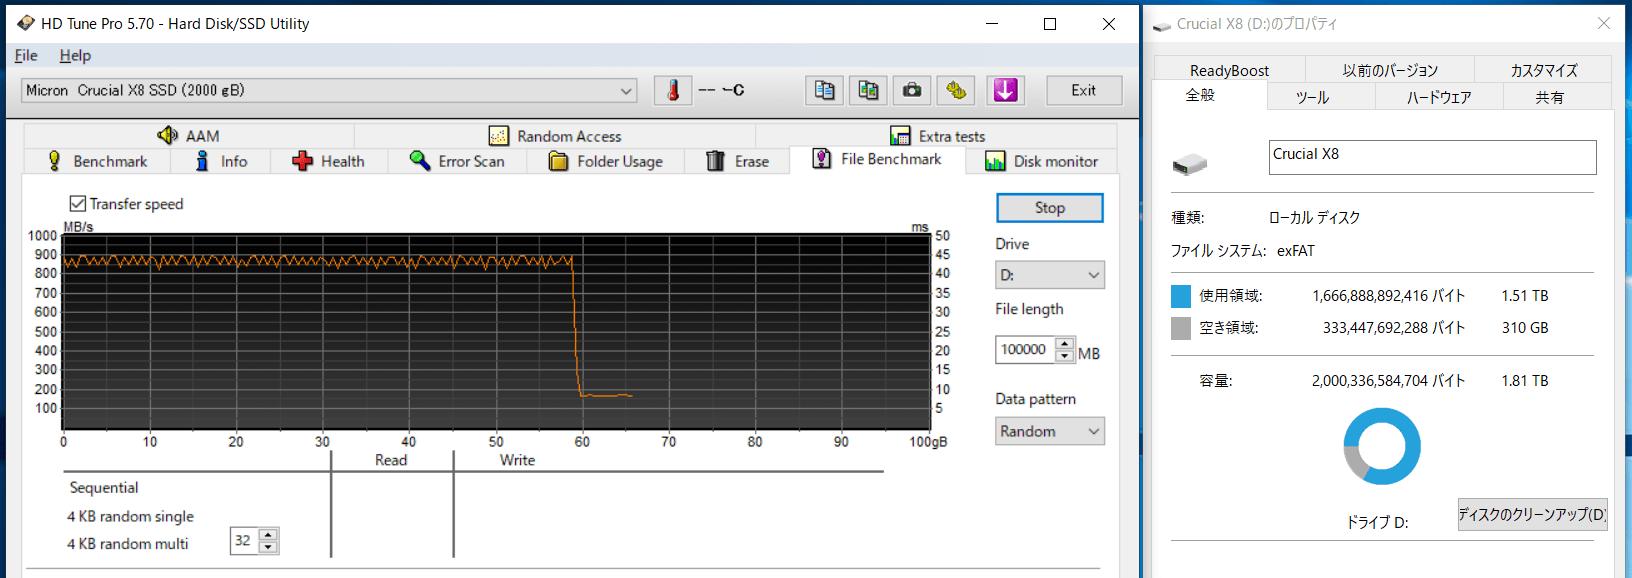 Crucial X8 Portable SSD 2TB_HDT_1.5TB-Fill